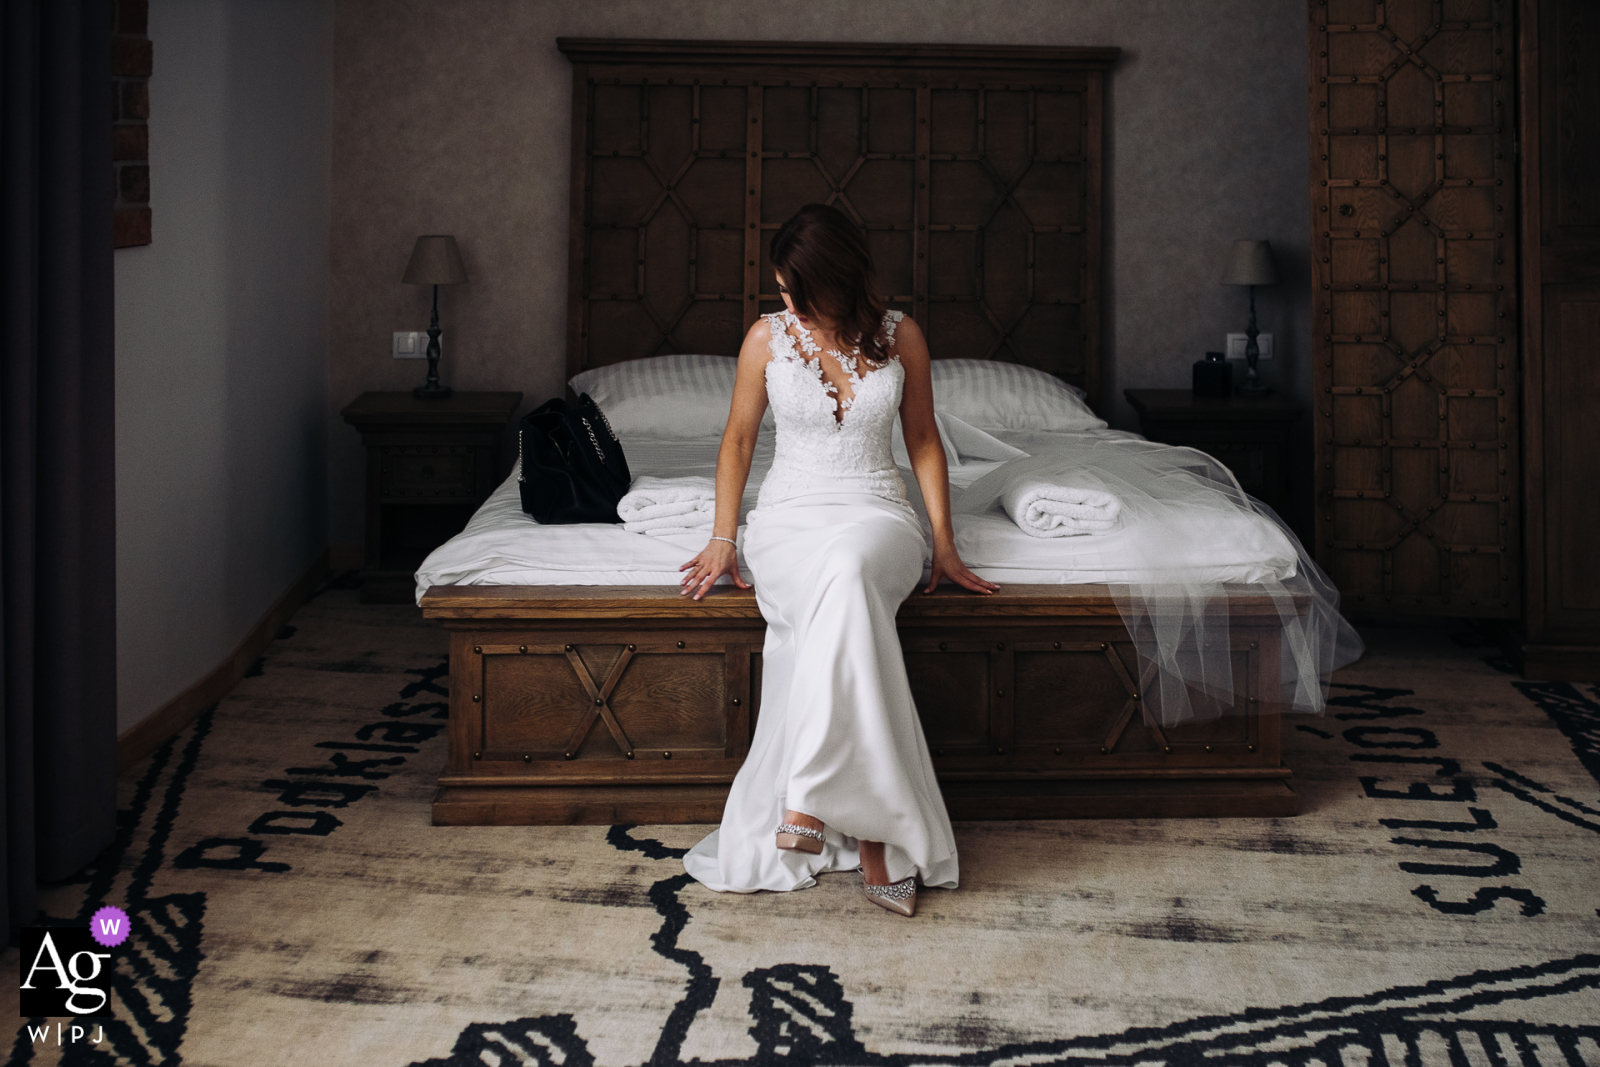 Best Western Hotel artistic wedding photo of a Lodzkie Podklasztorze, Sulejow, Poland Bride sitting on the bed in her room